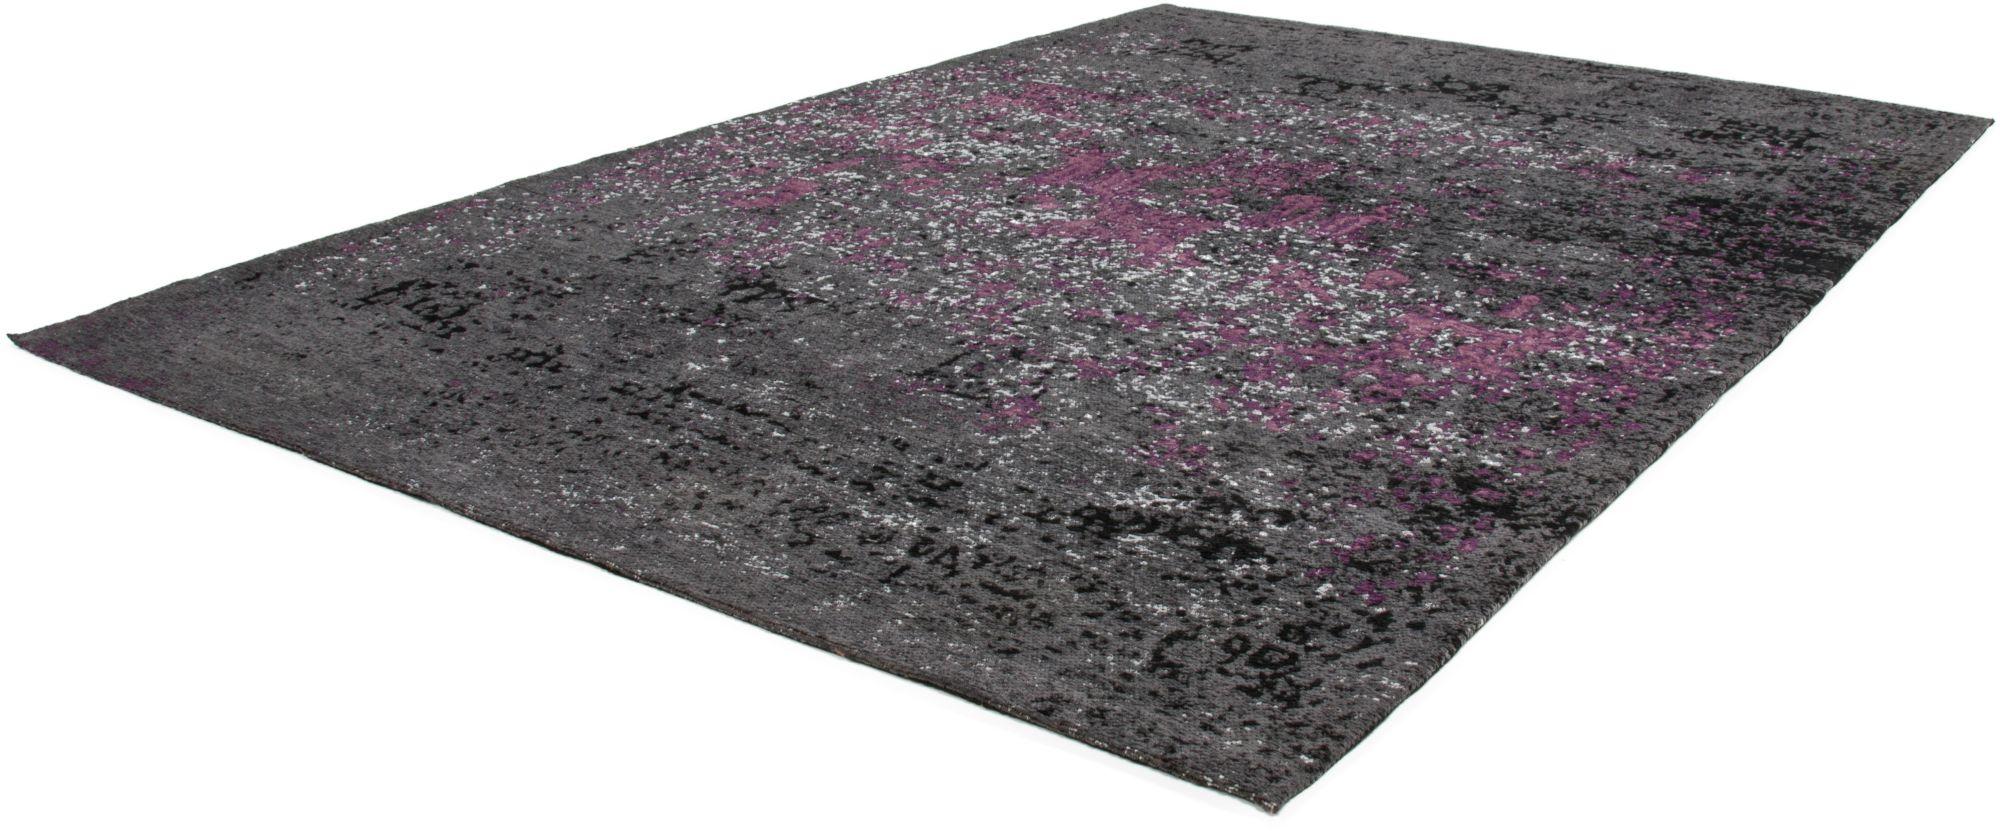 Teppich, »Cocoon991«, Lalee, rechteckig, Höhe 8 mm, handgewebt